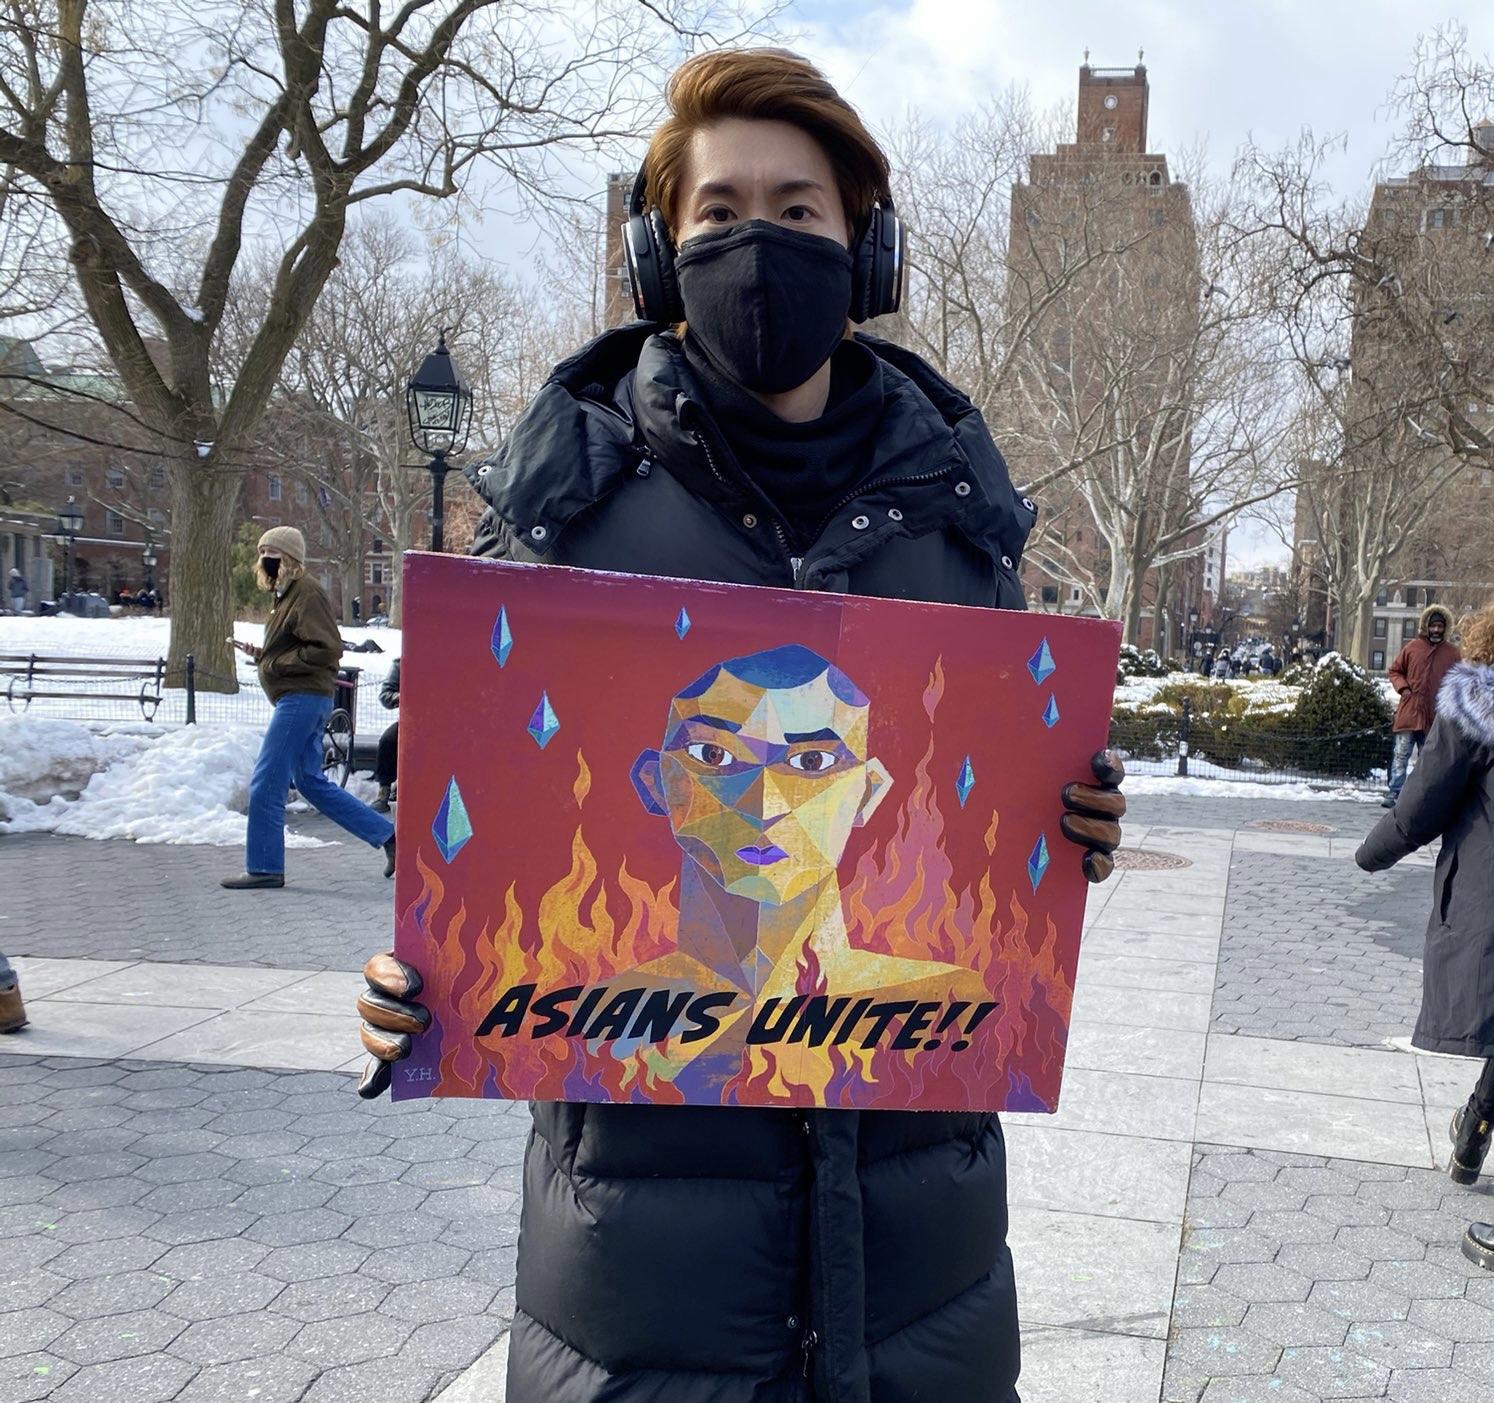 Protestor Yohey Horishita holding a painting with 'Asians Unite' across it.